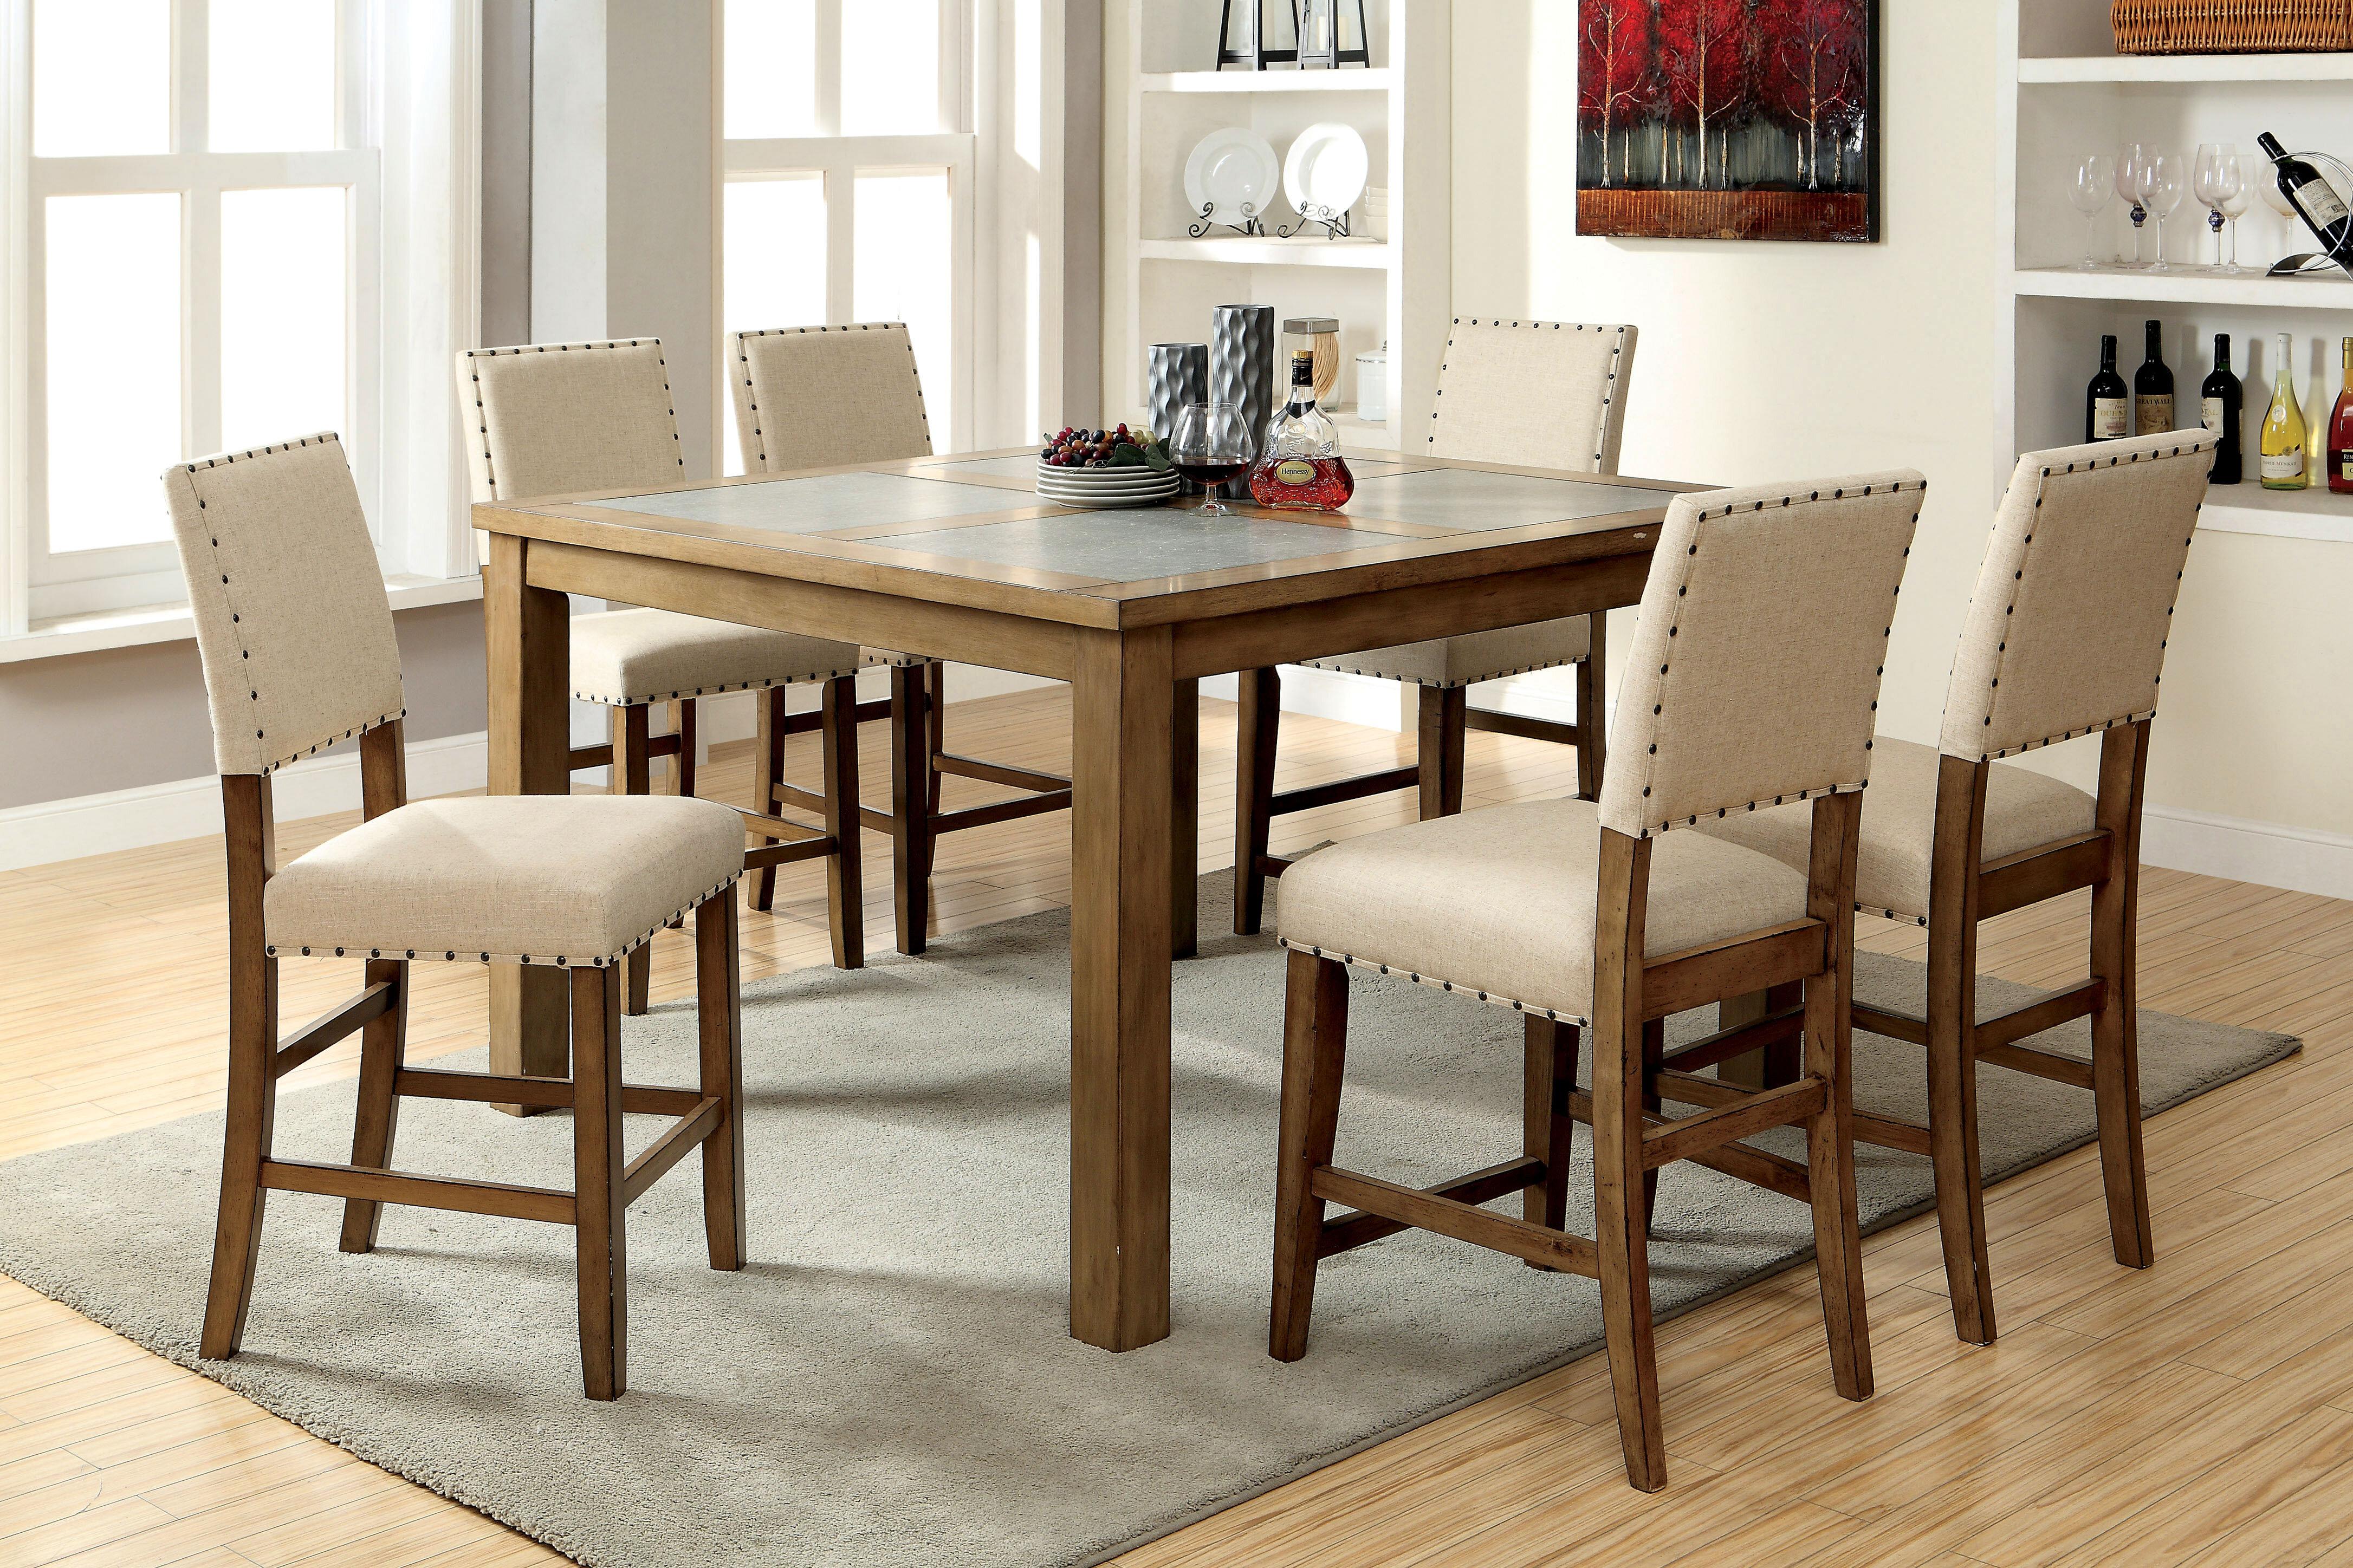 Superbe Crafton 9 Piece Pub Table Set